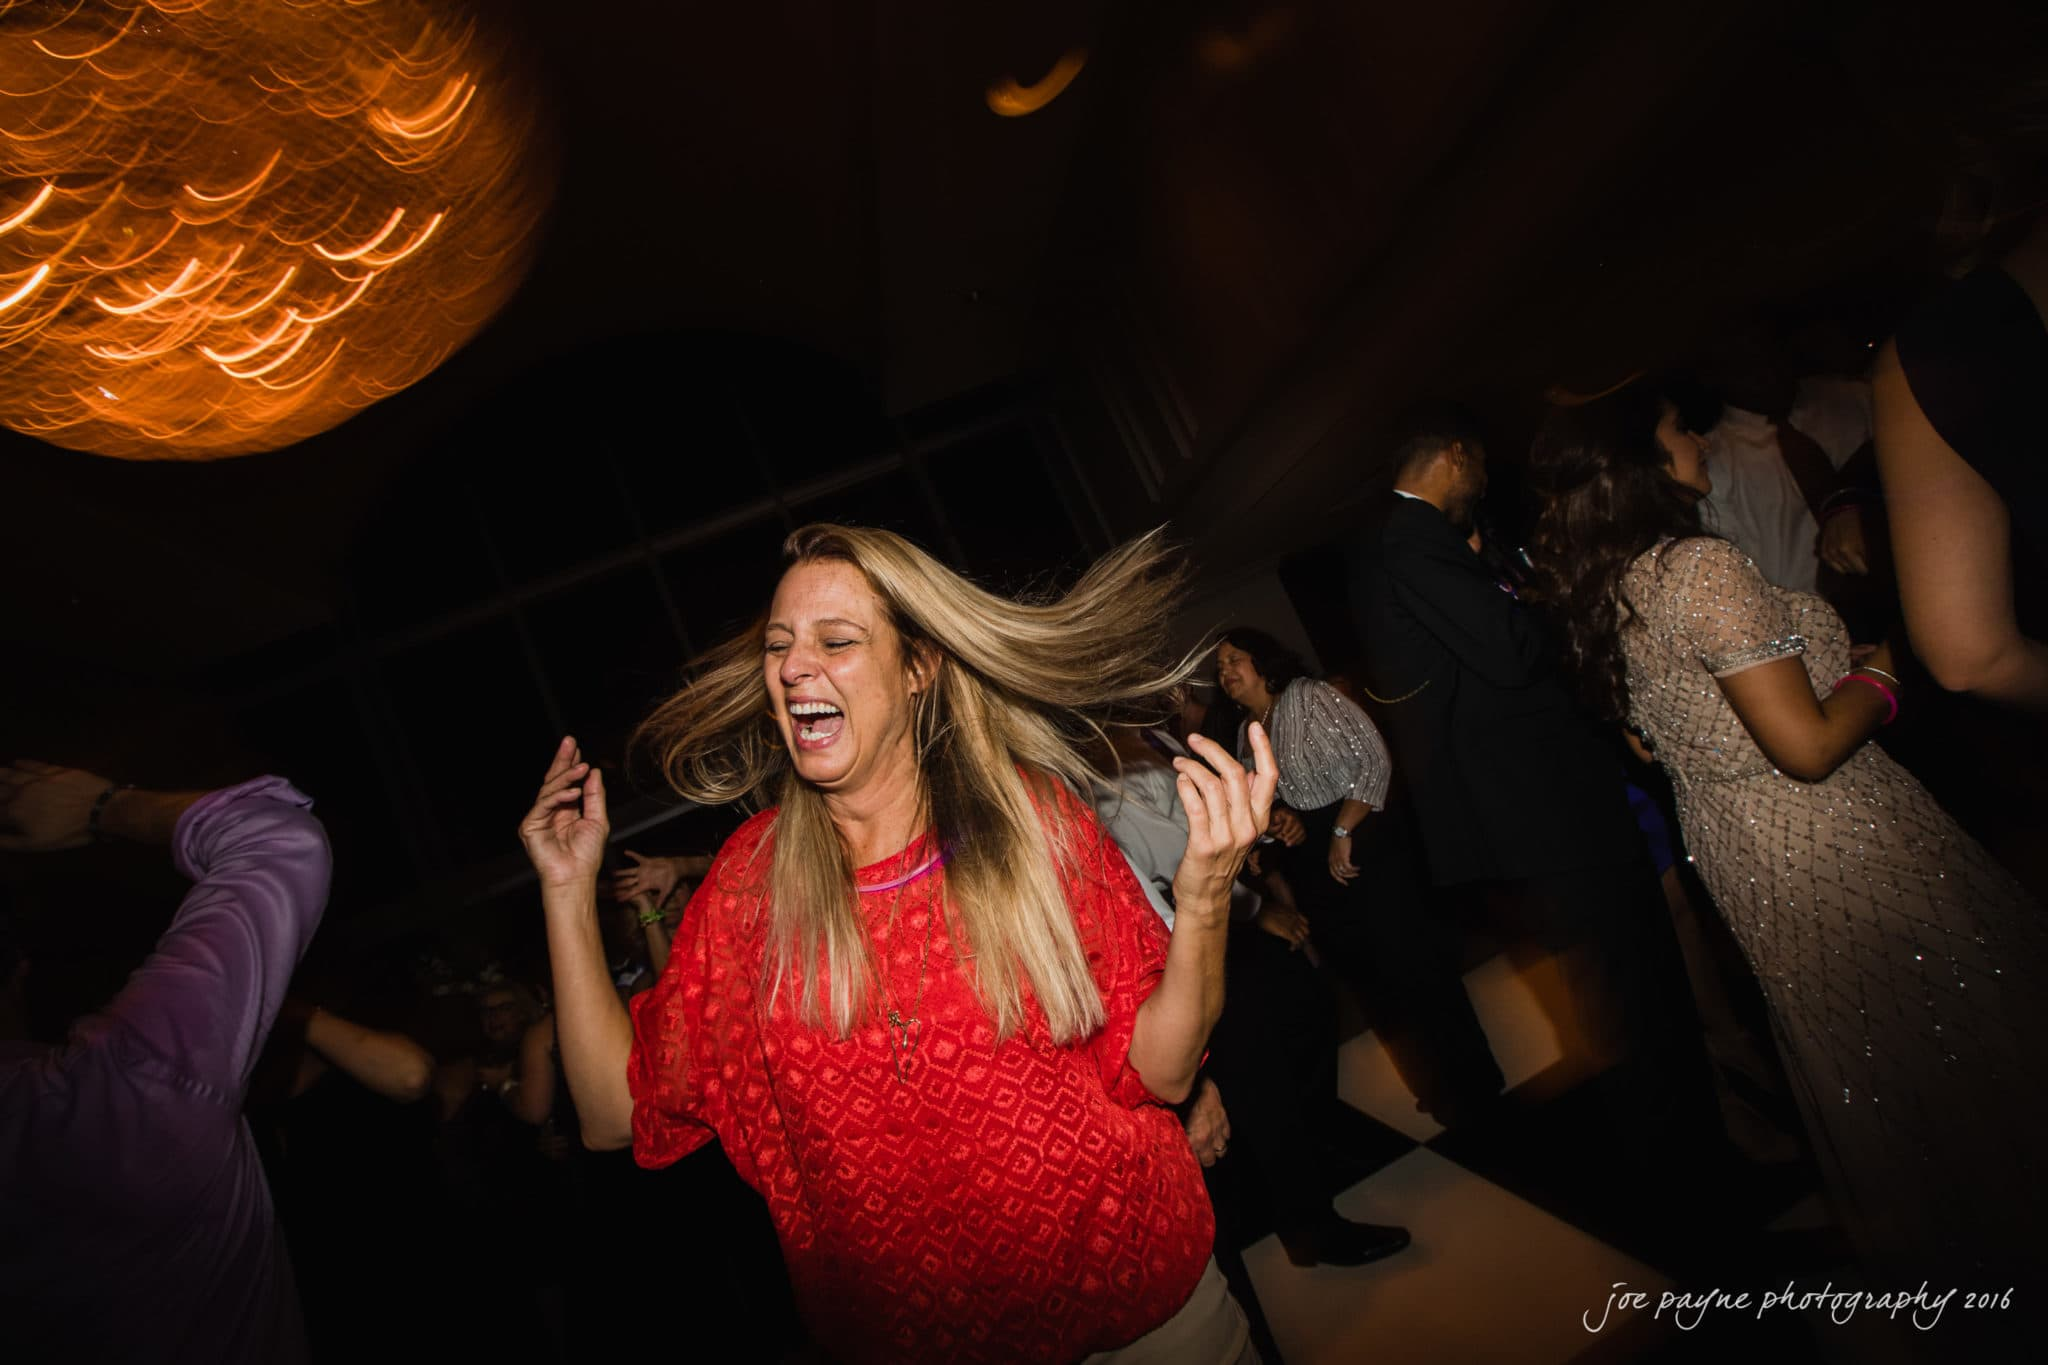 city-club-raleigh-wedding-photography-lauren-adam-59